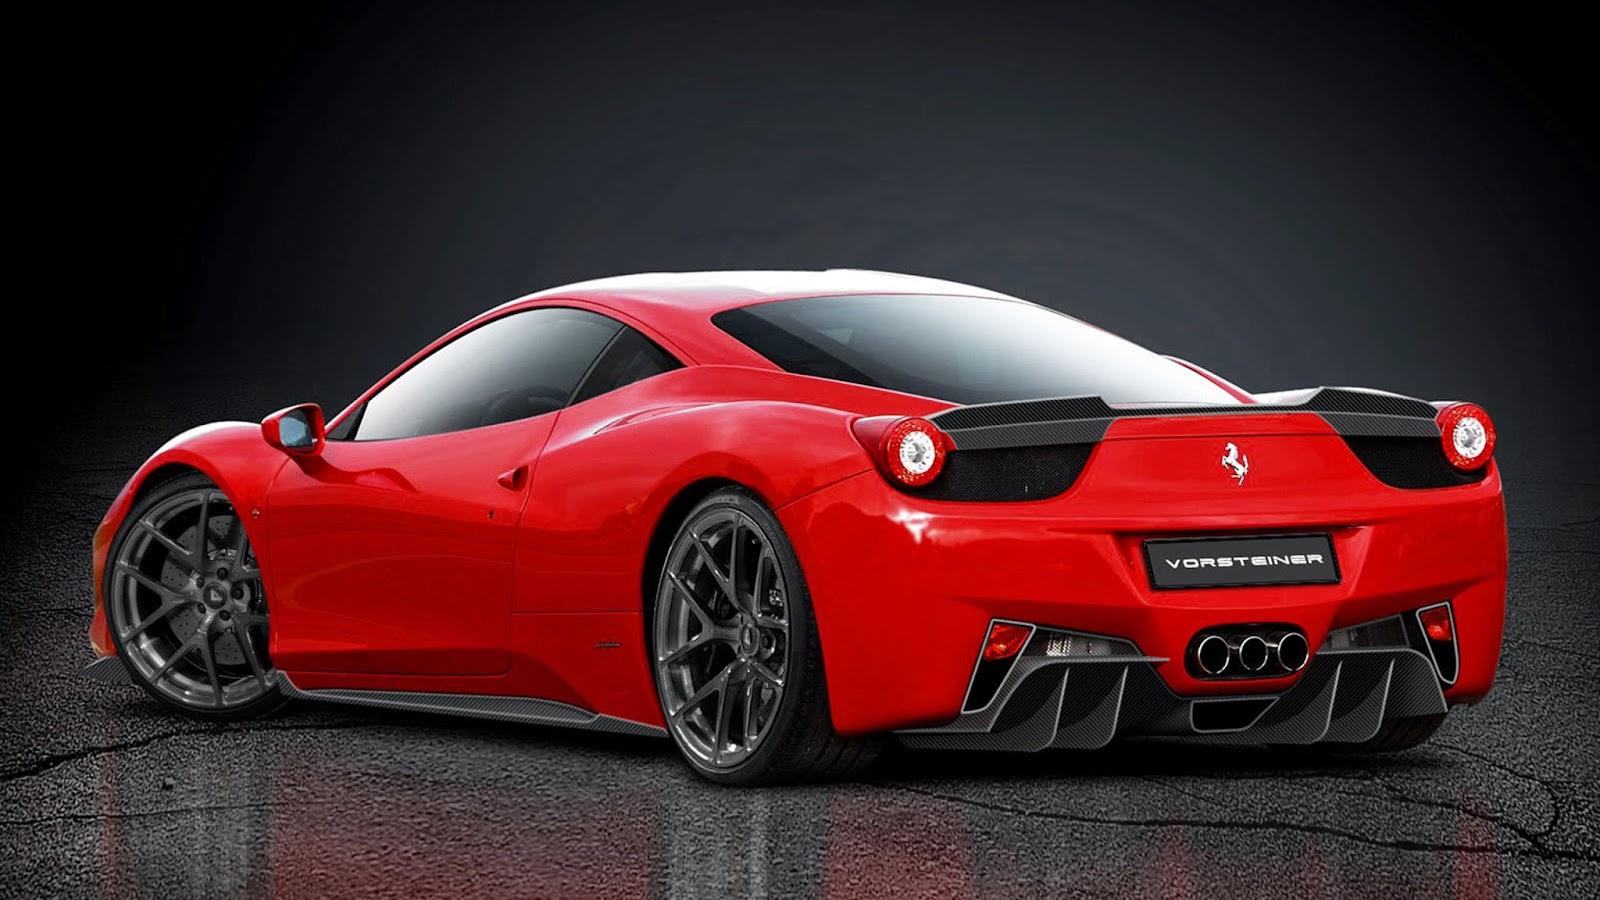 Wallpaper Mobil Sport Ferrari Teranyar